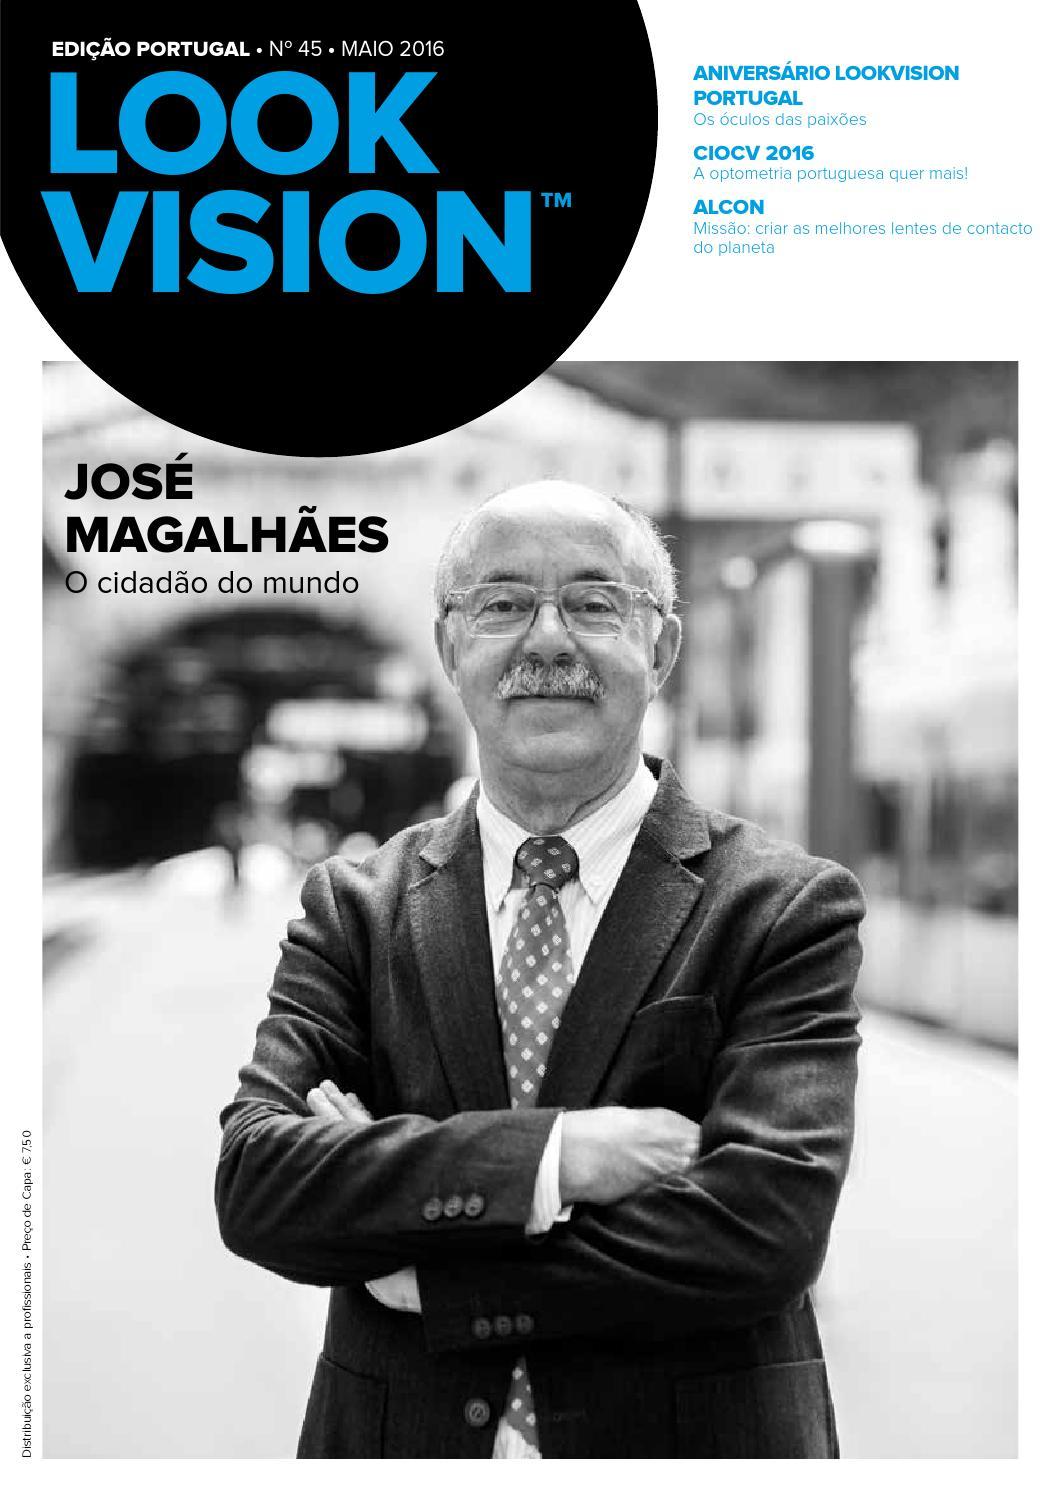 fac9962bb3302 Lookvision45 issuu by LookVision Portugal - issuu